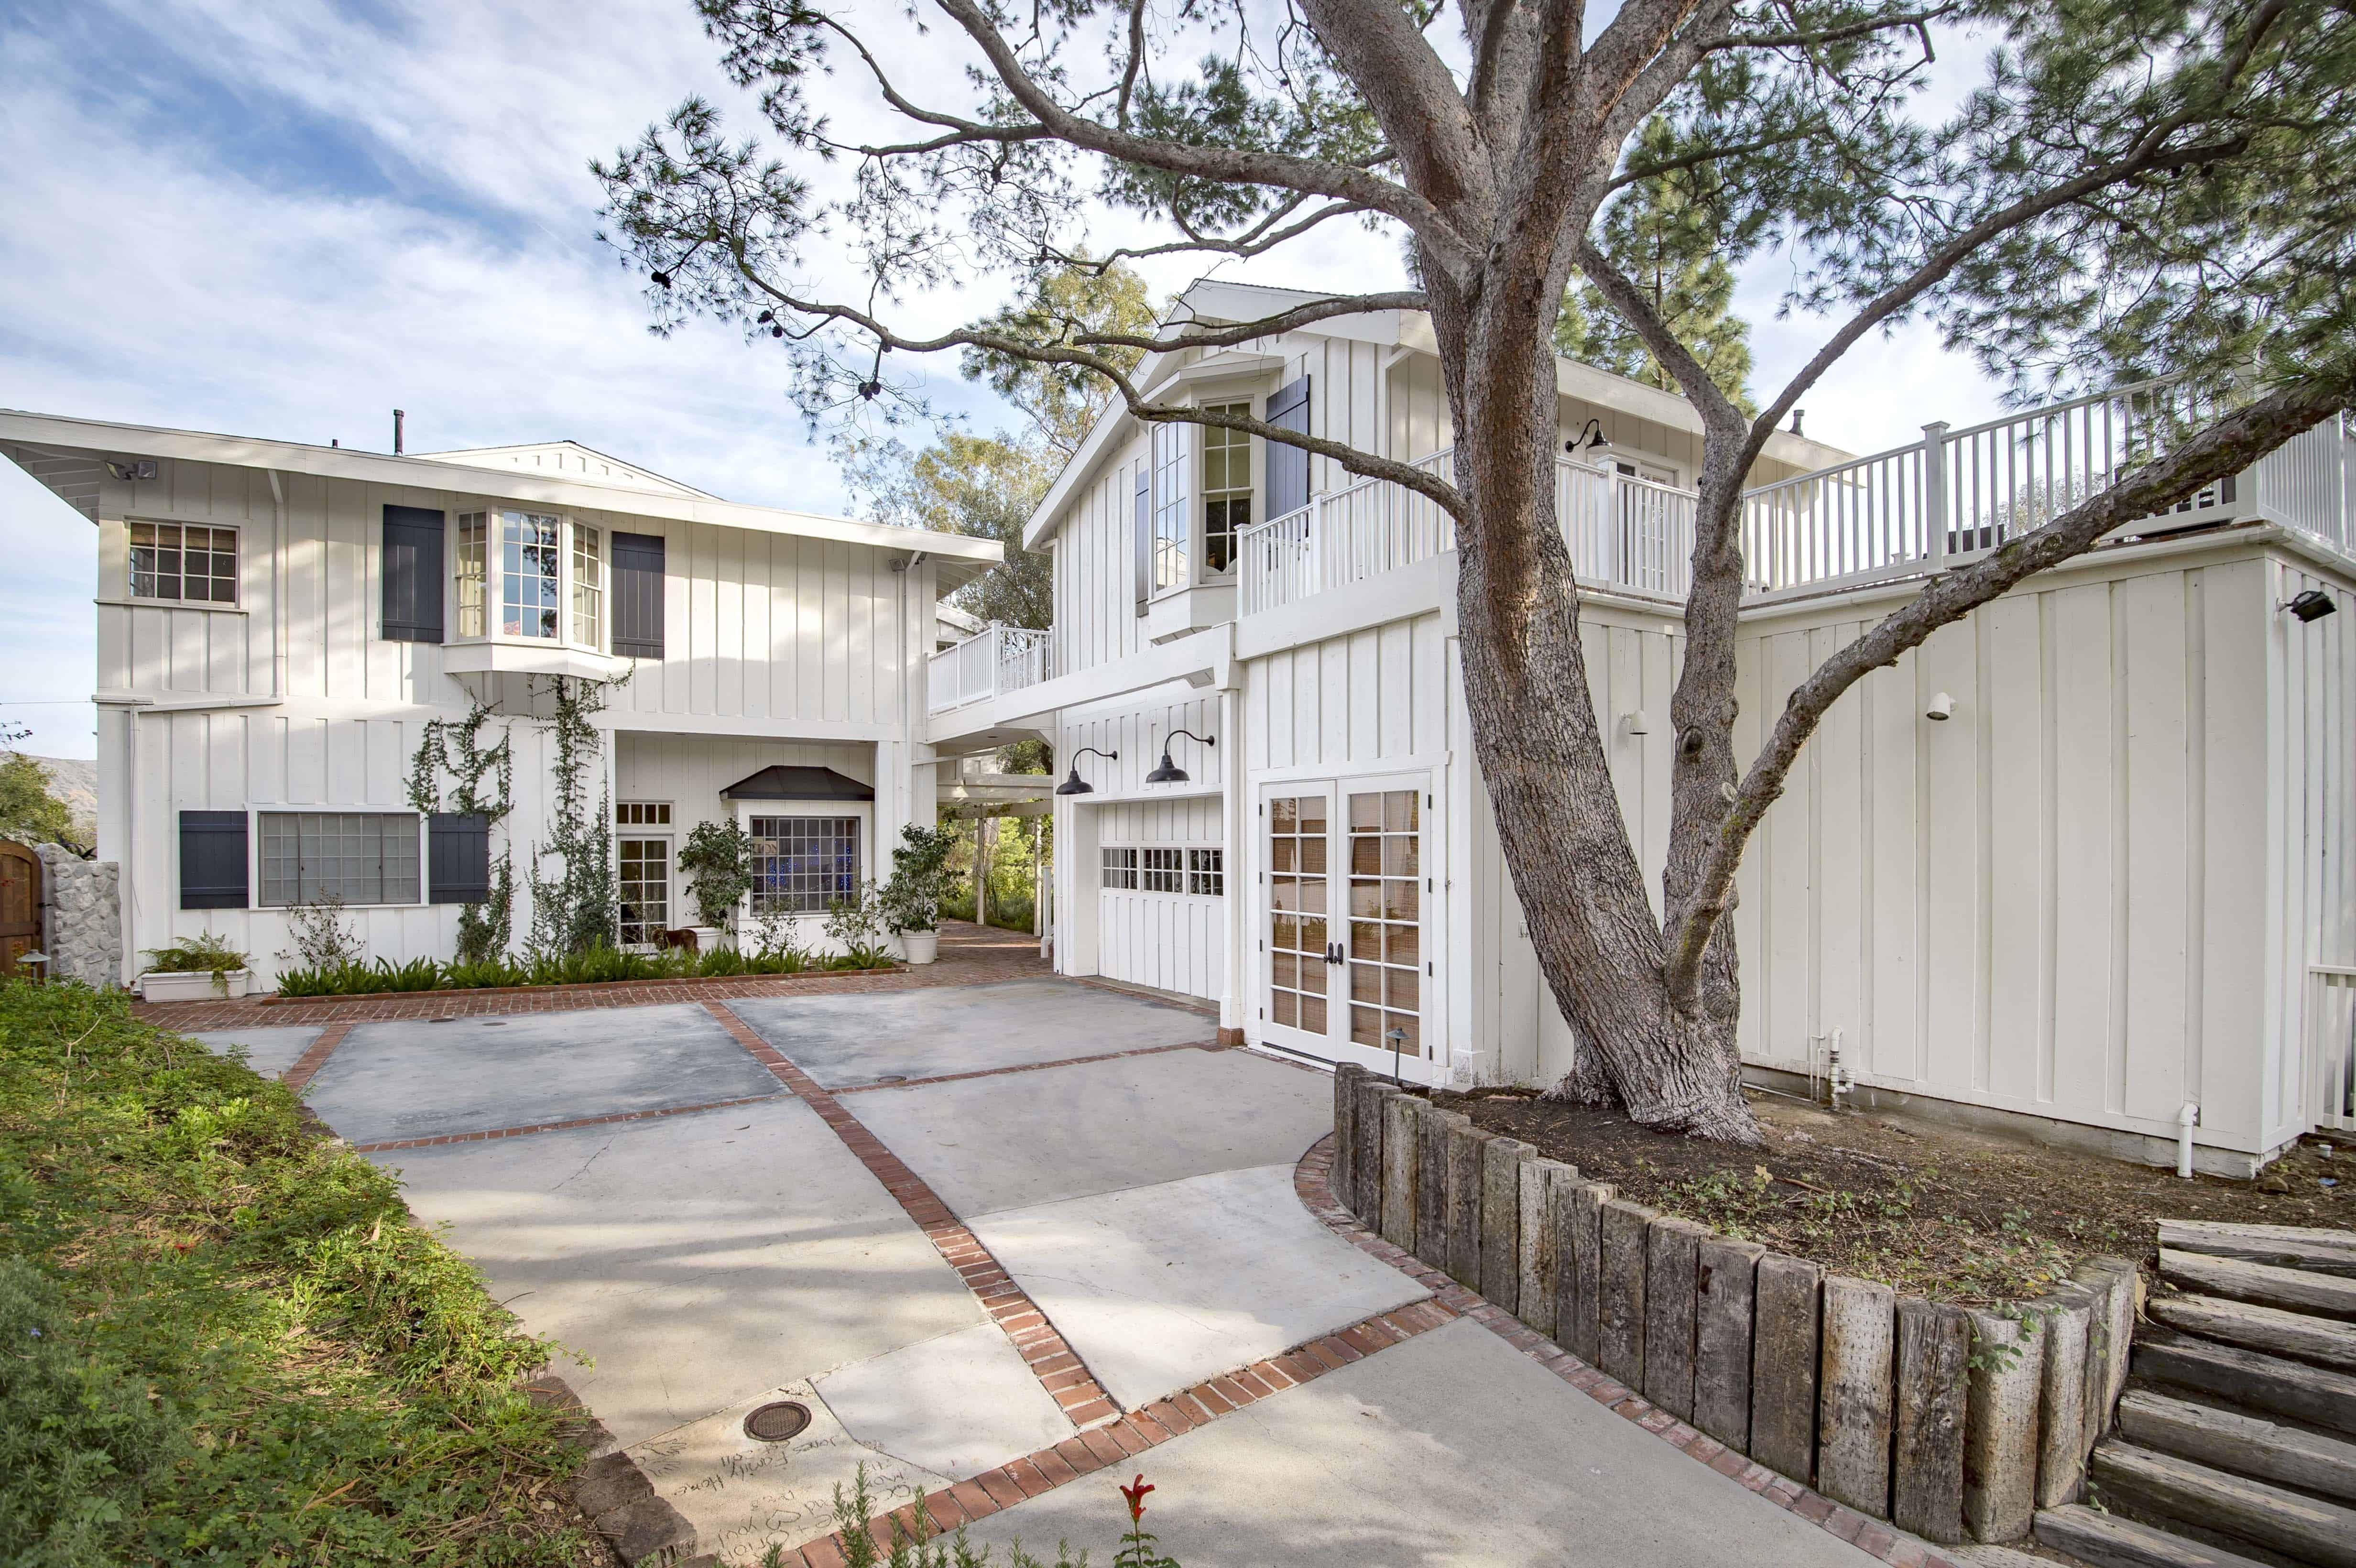 Olivia Newton-John's Former Ranch-Style Home